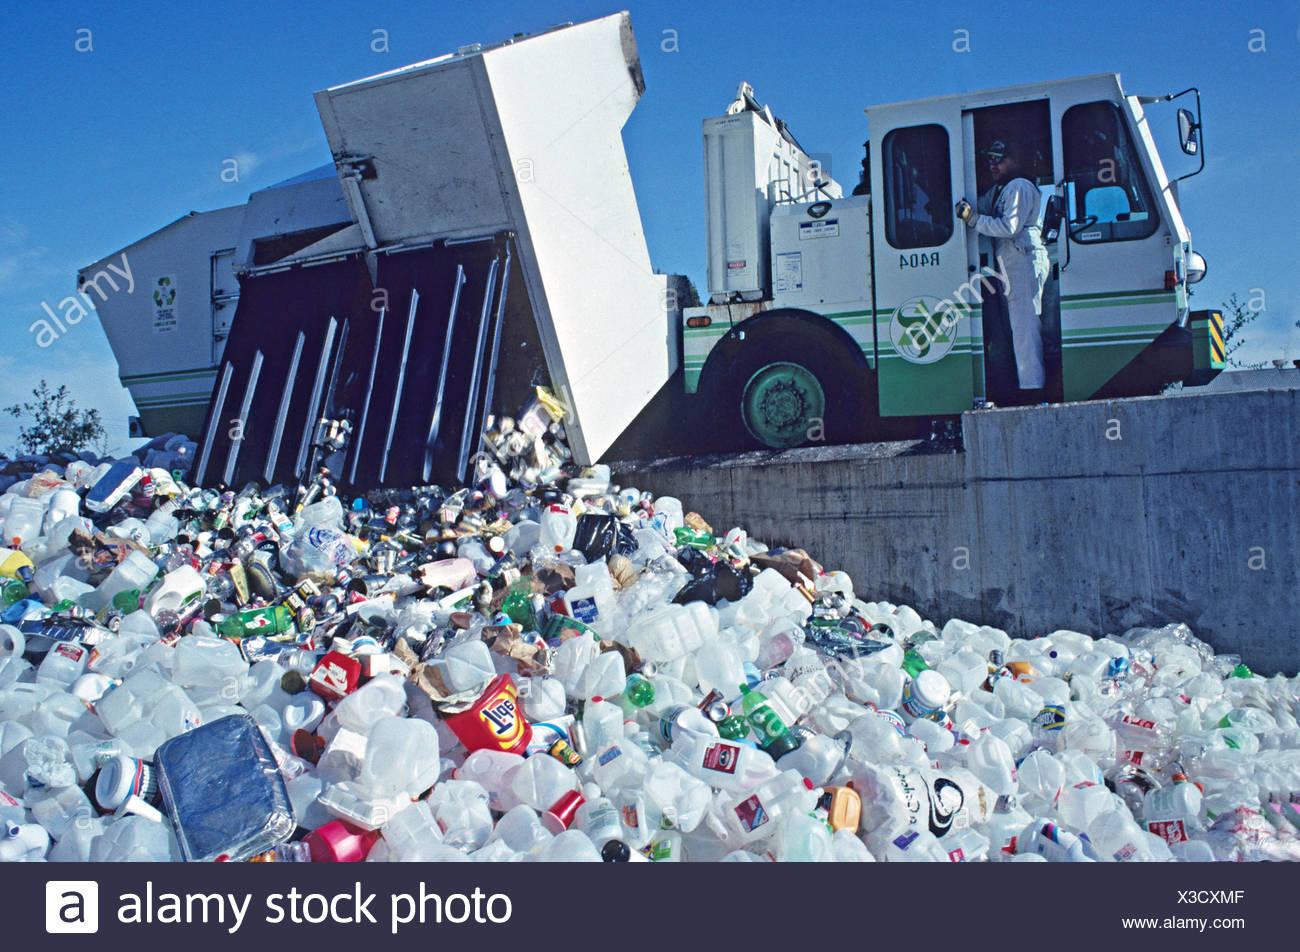 recycling station Richmond California - Stock Image